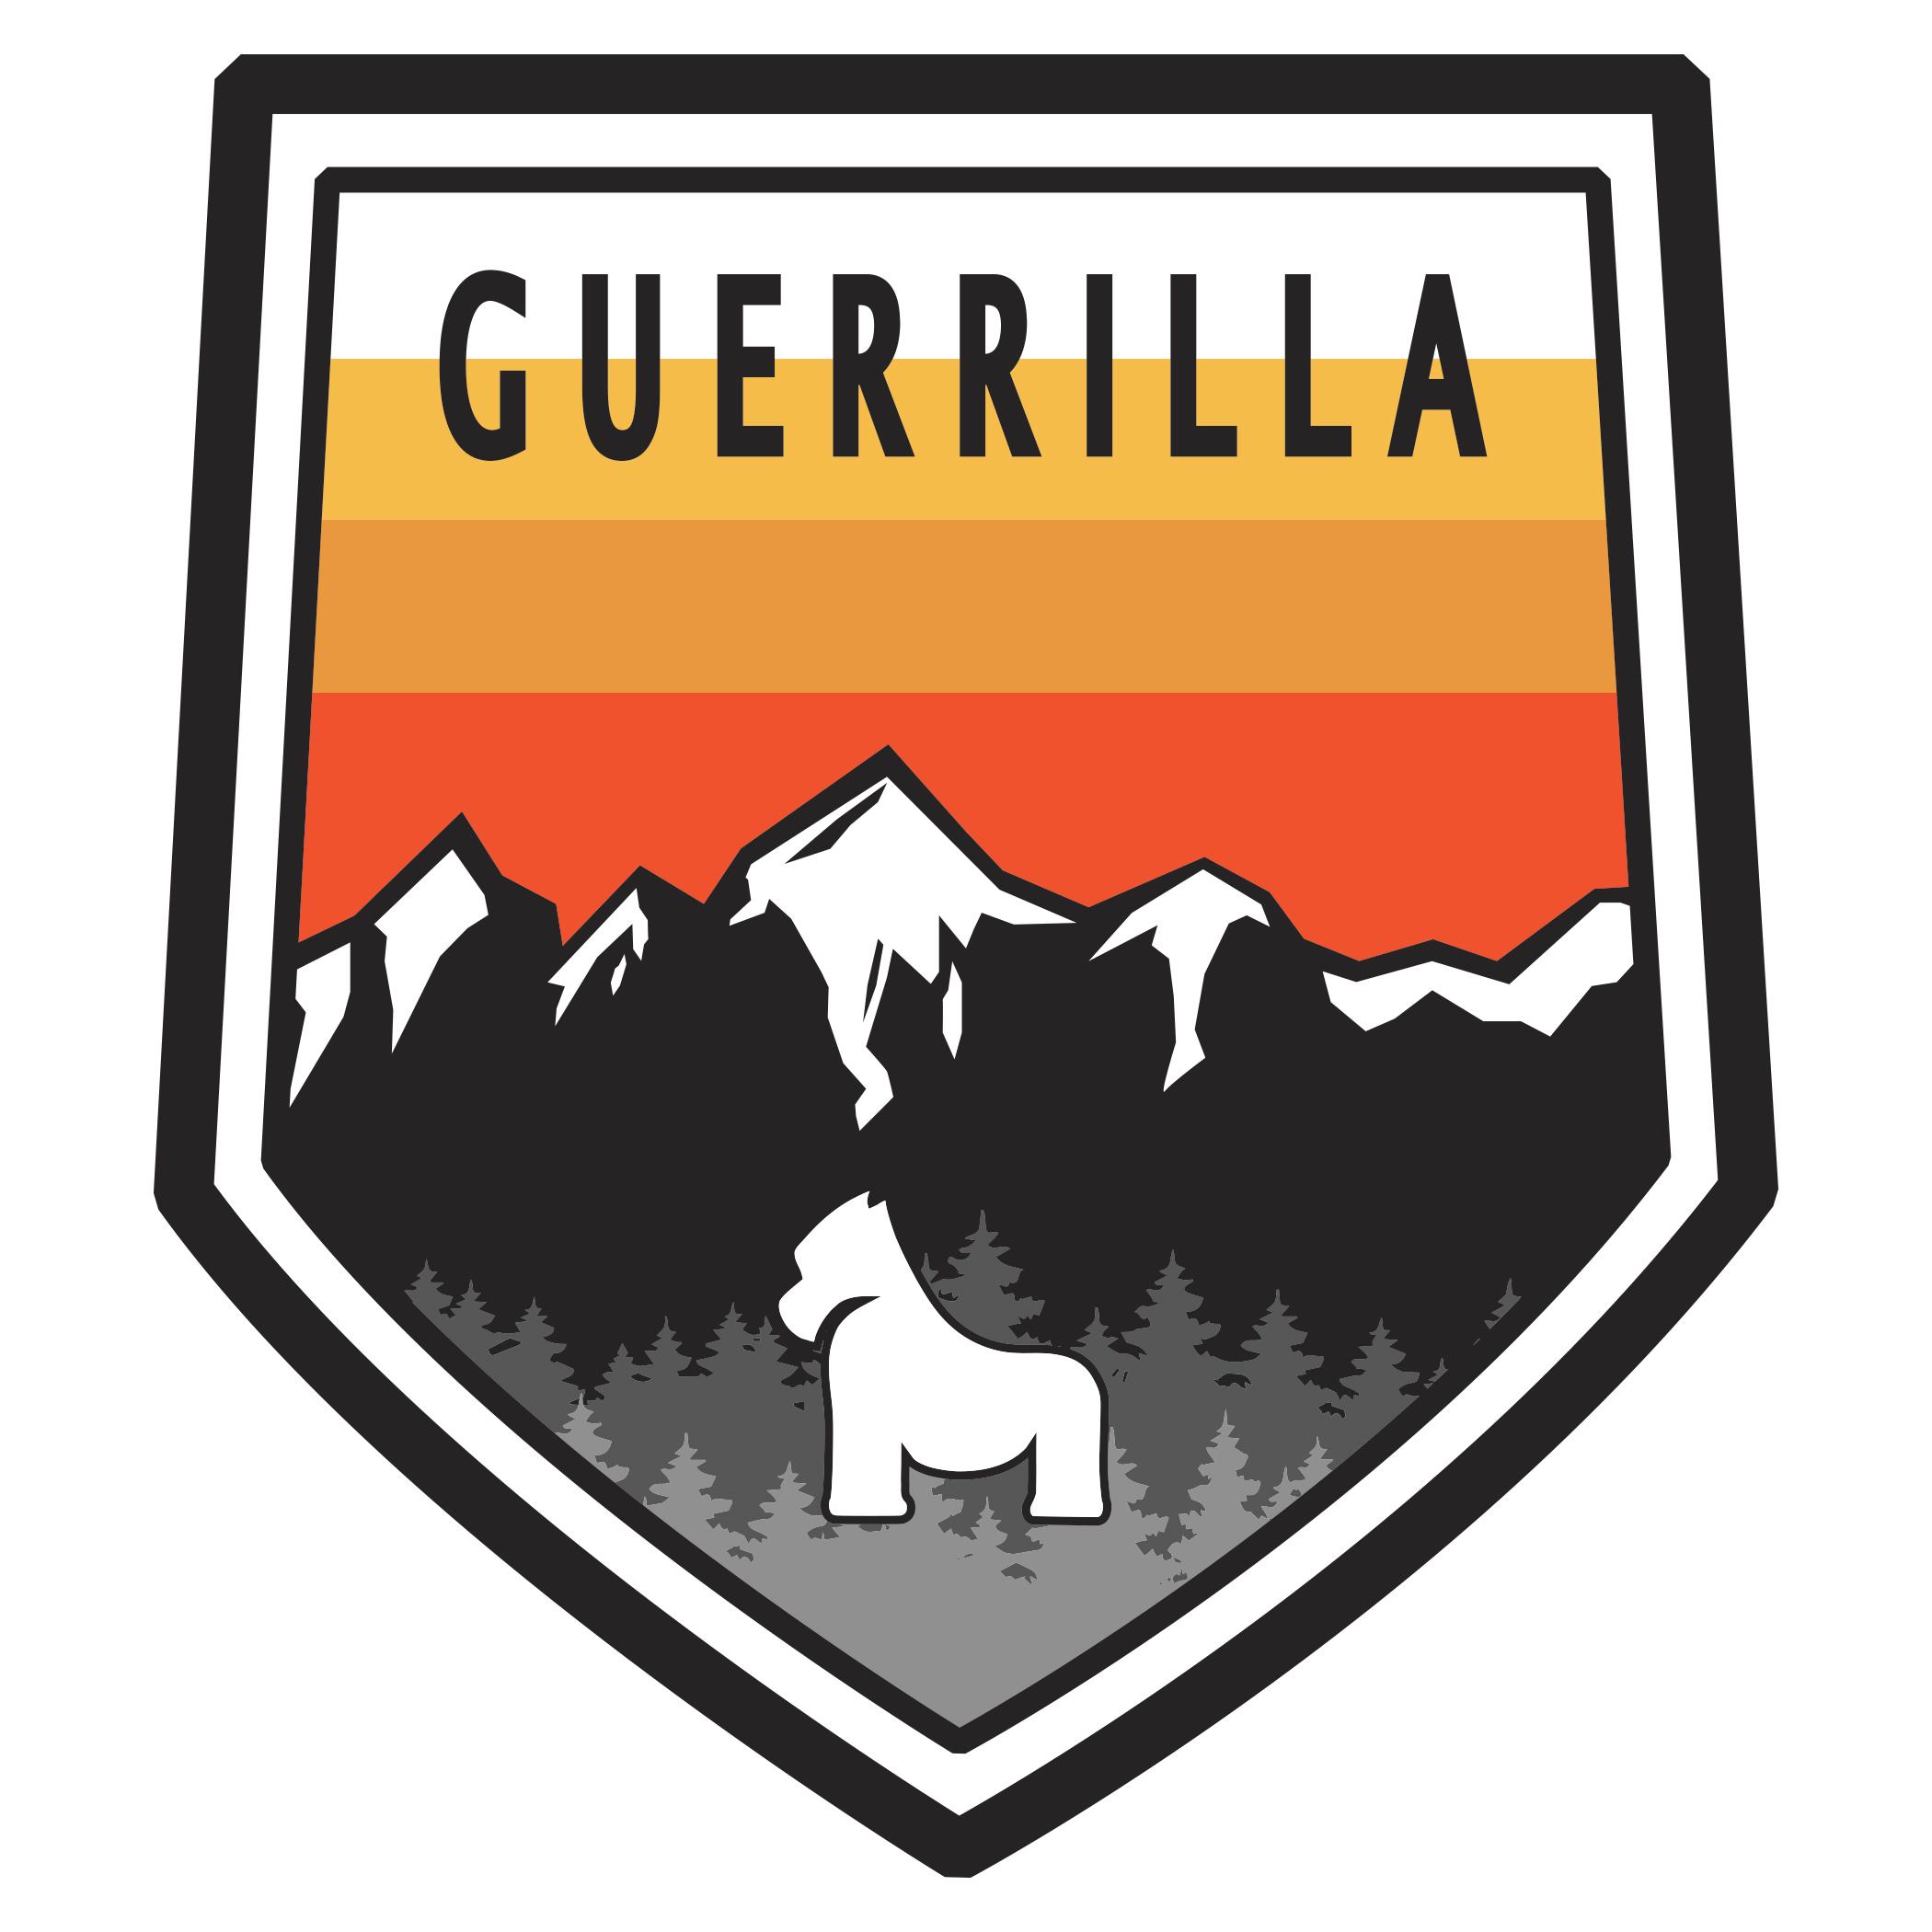 Guerrilla Badge Sticker